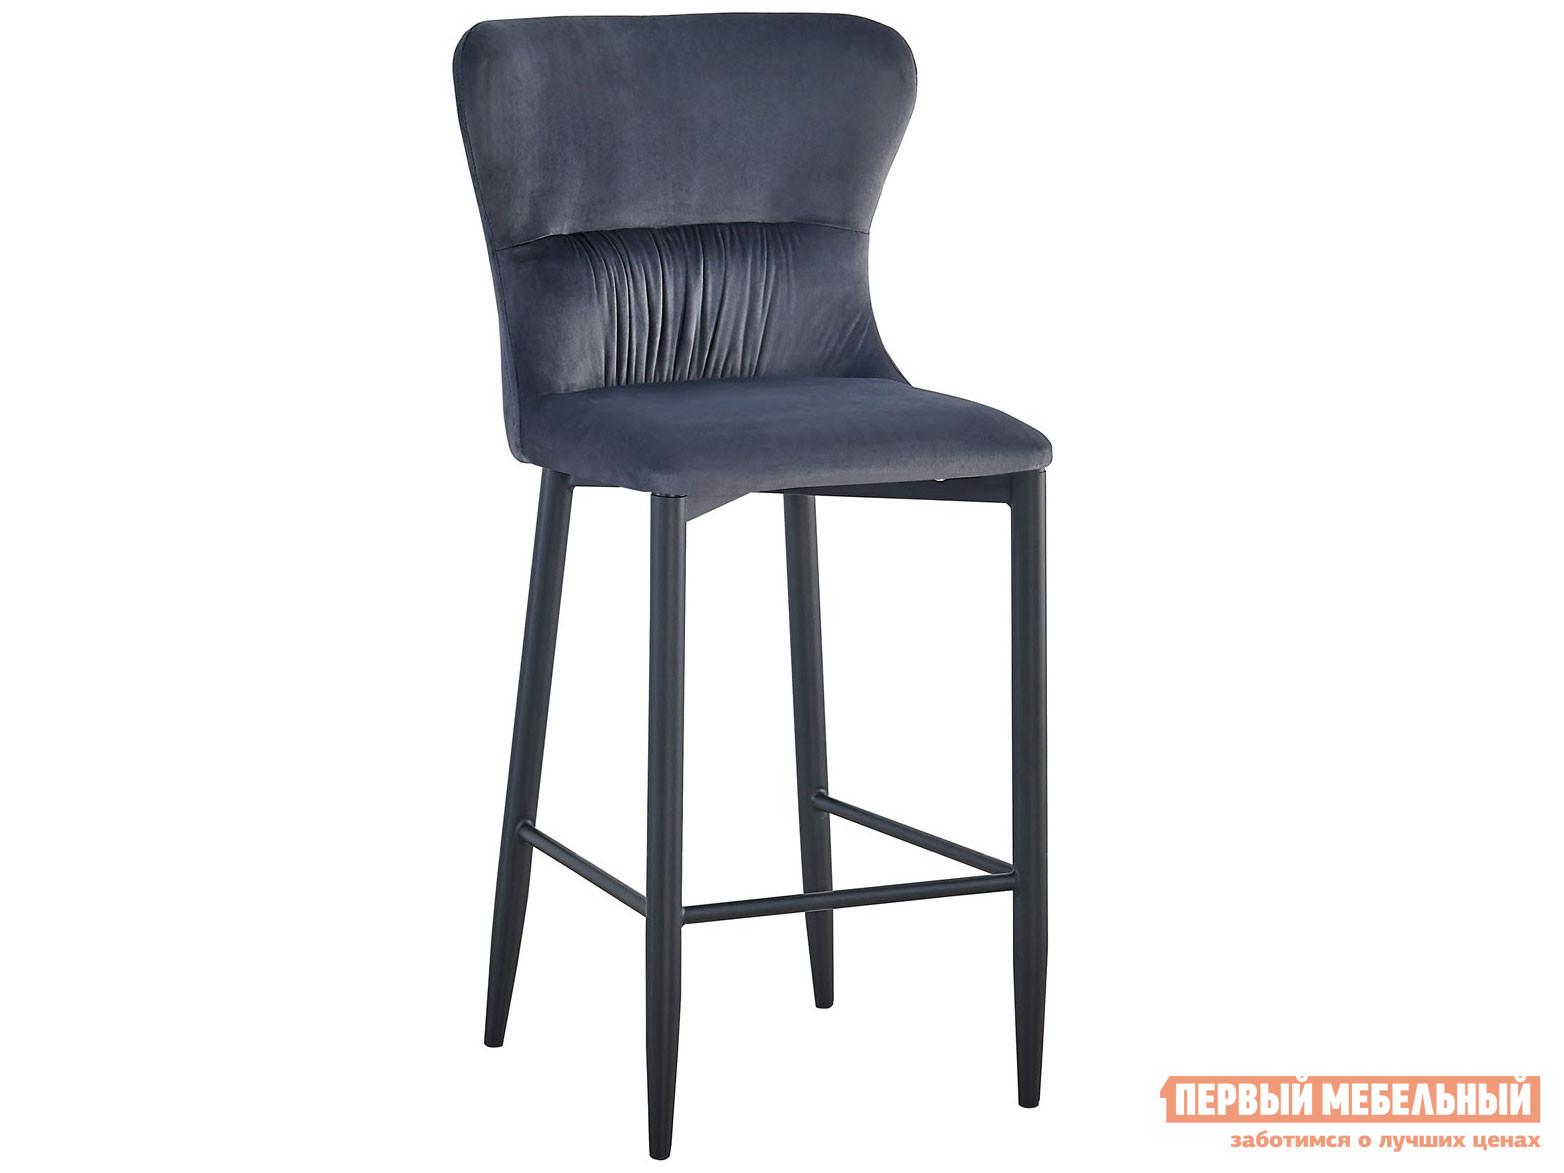 Барный стул  полубарный Лилиан MC151C VELVET Серый, велюр, Stool Group 116102